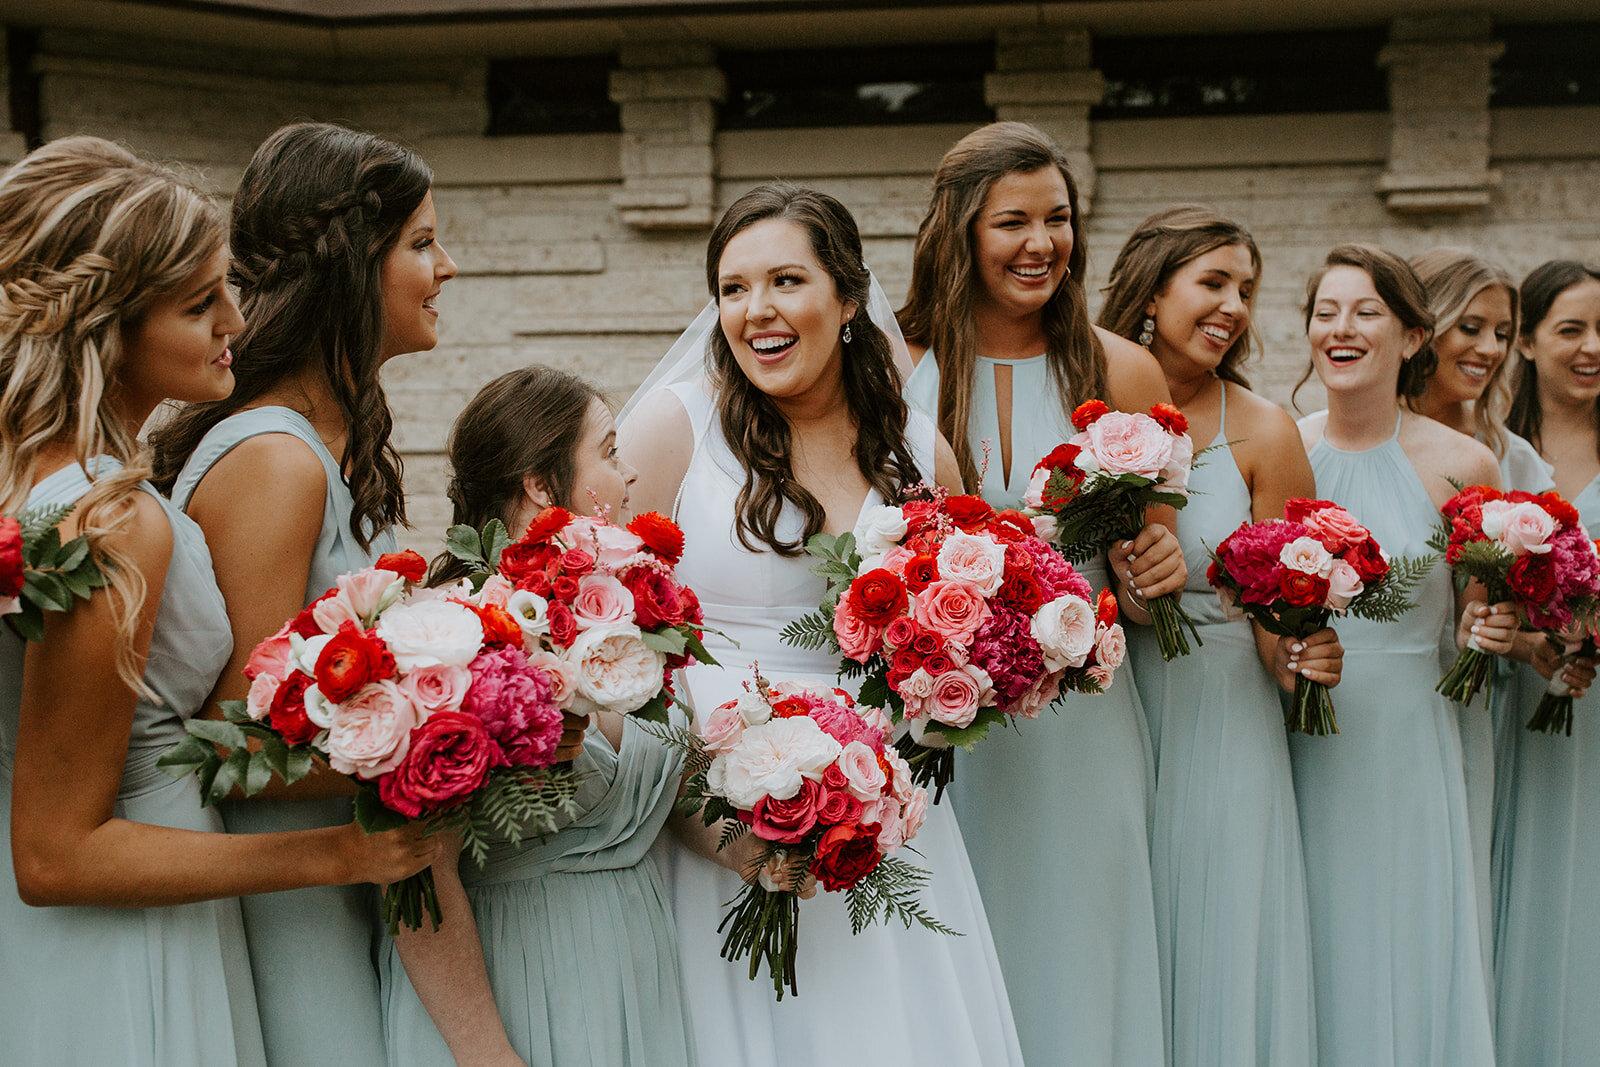 tori-matthews-photography-houston-texas-wedding-photographer-2-251.jpg